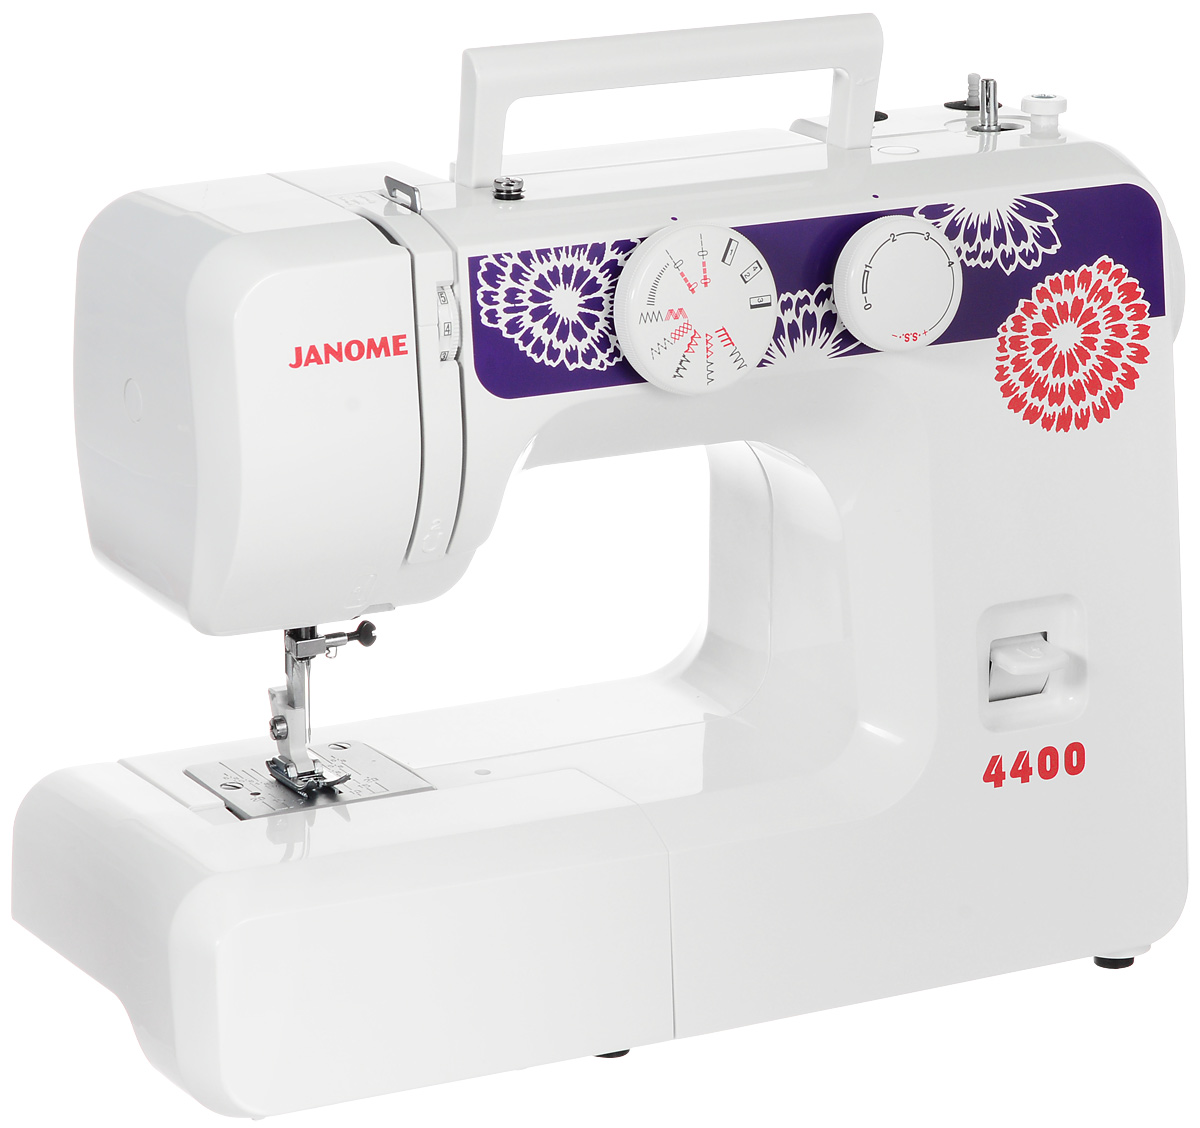 Janome 4400 швейная машина швейная машина janome 4400